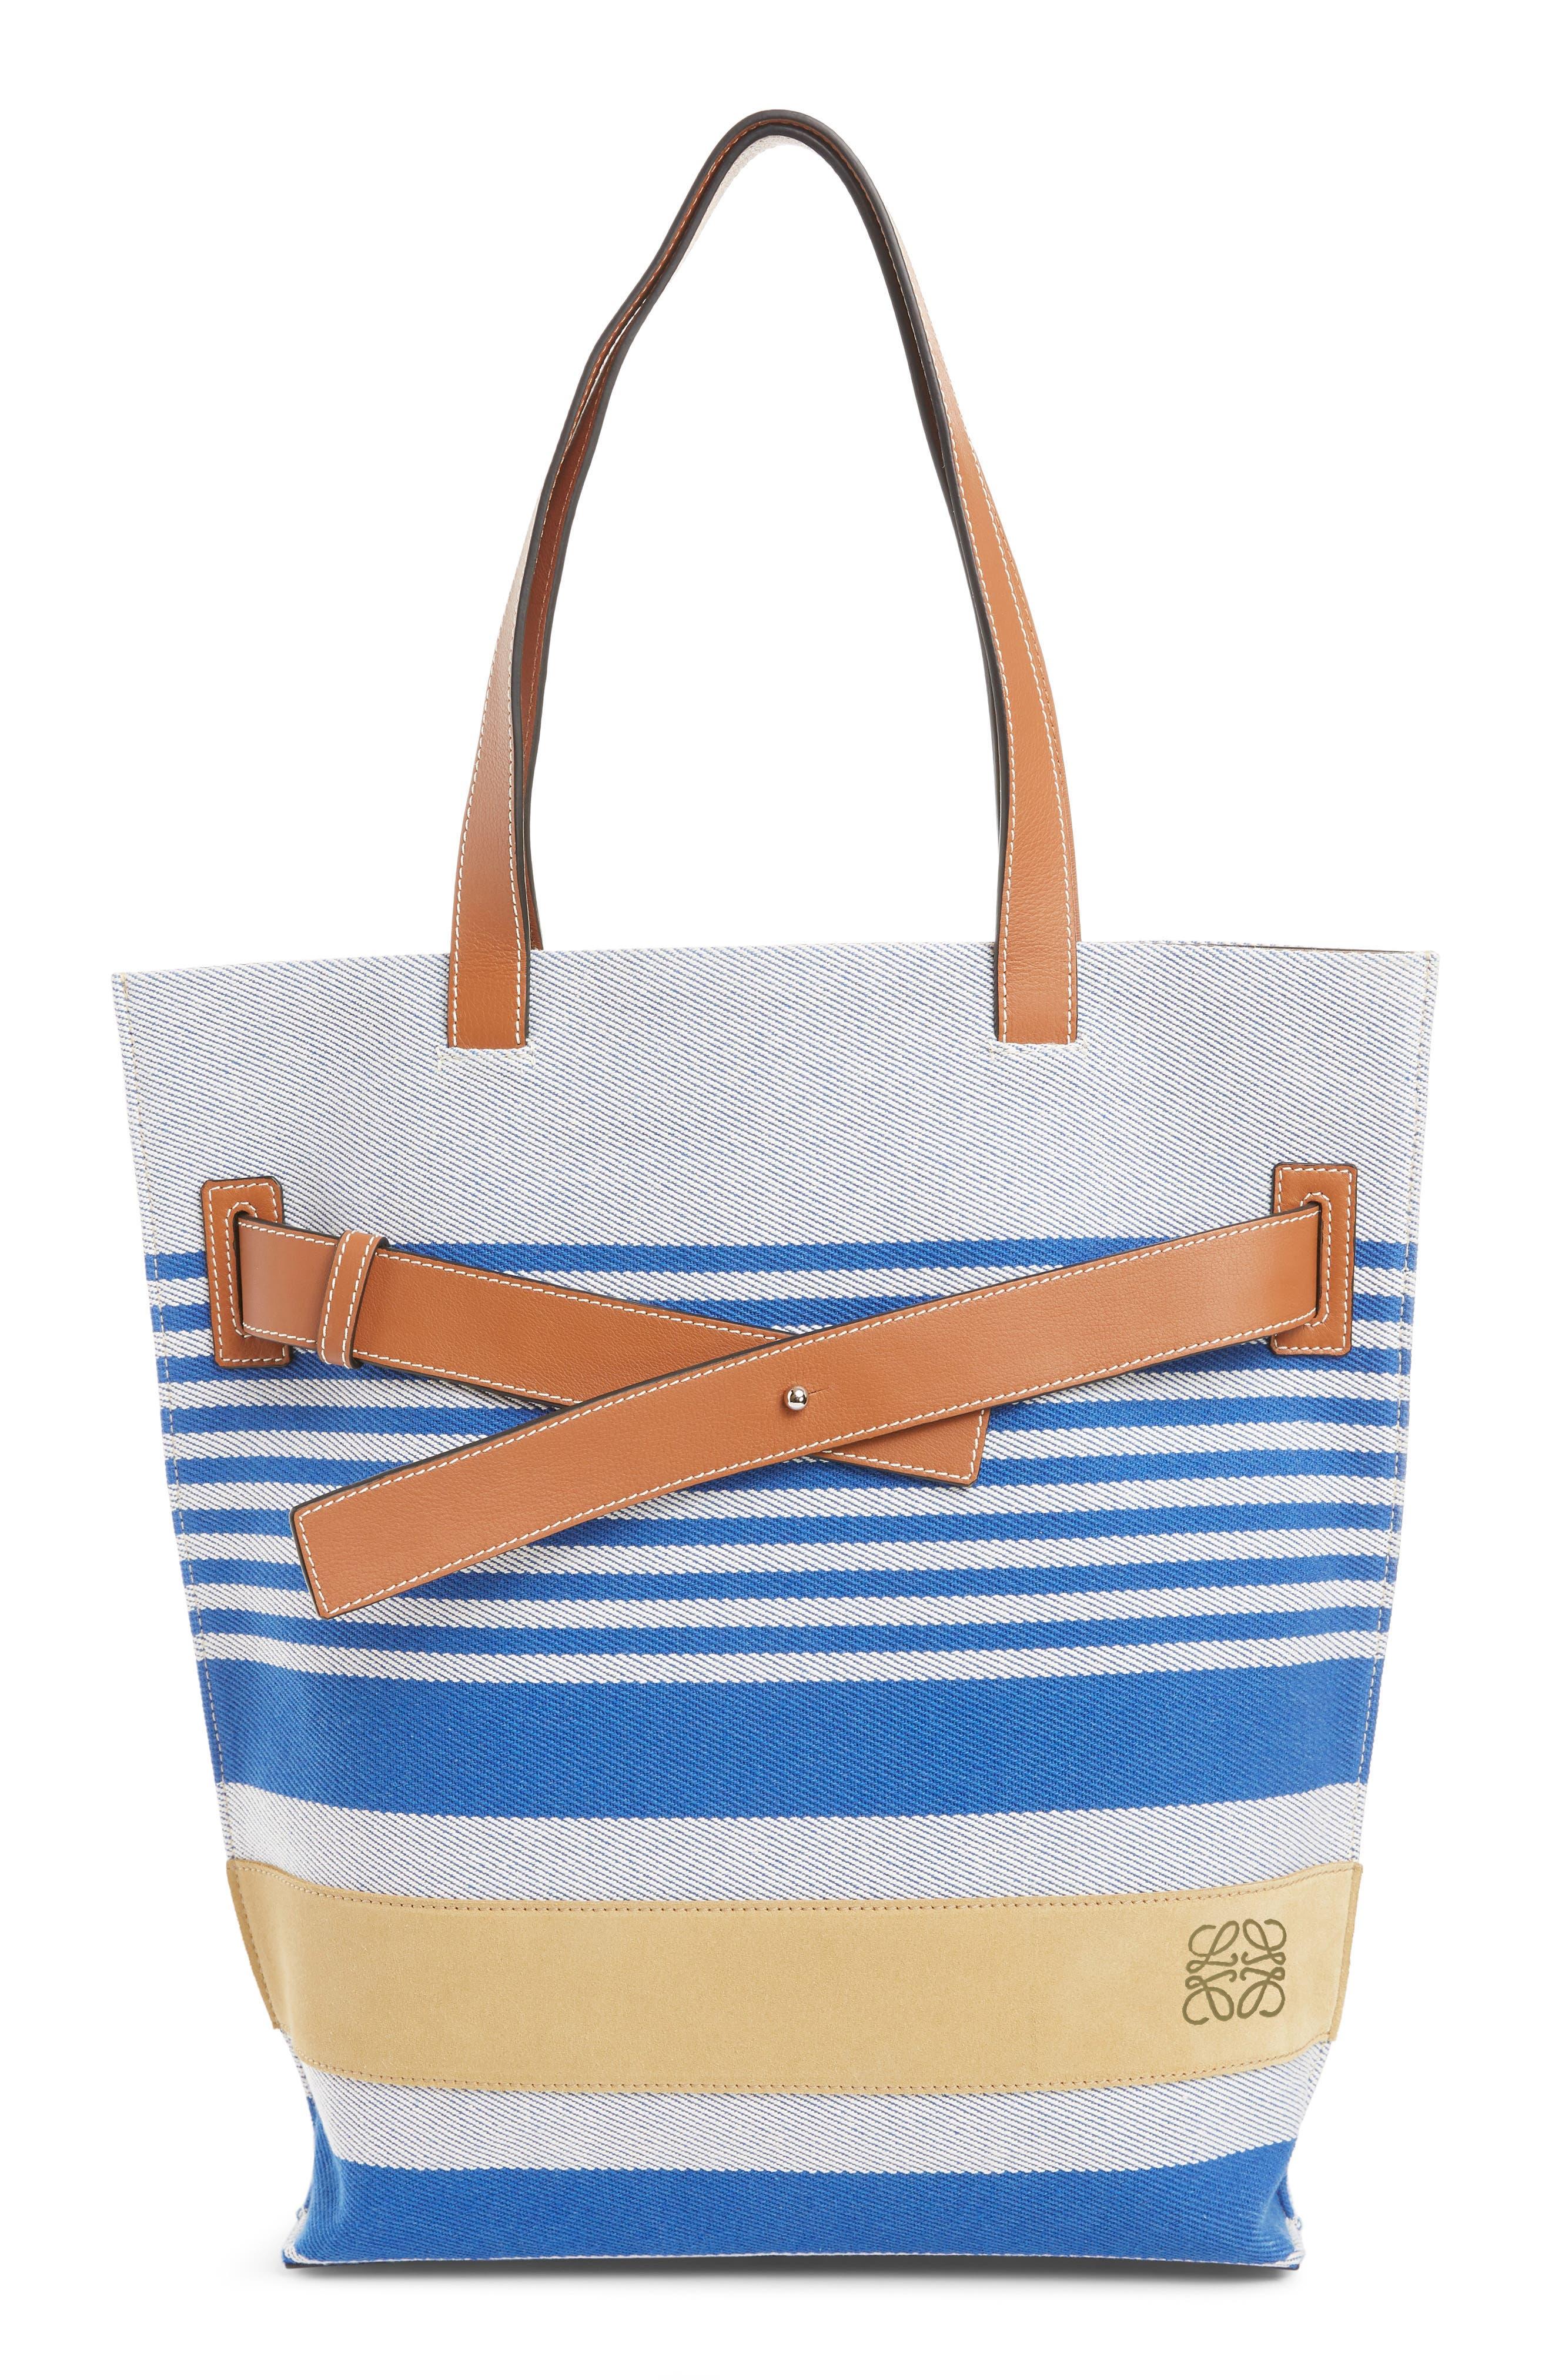 LOEWE Stripe Twill Tote Bag, Main, color, PACIFIC BLUE/MULTICOLOR